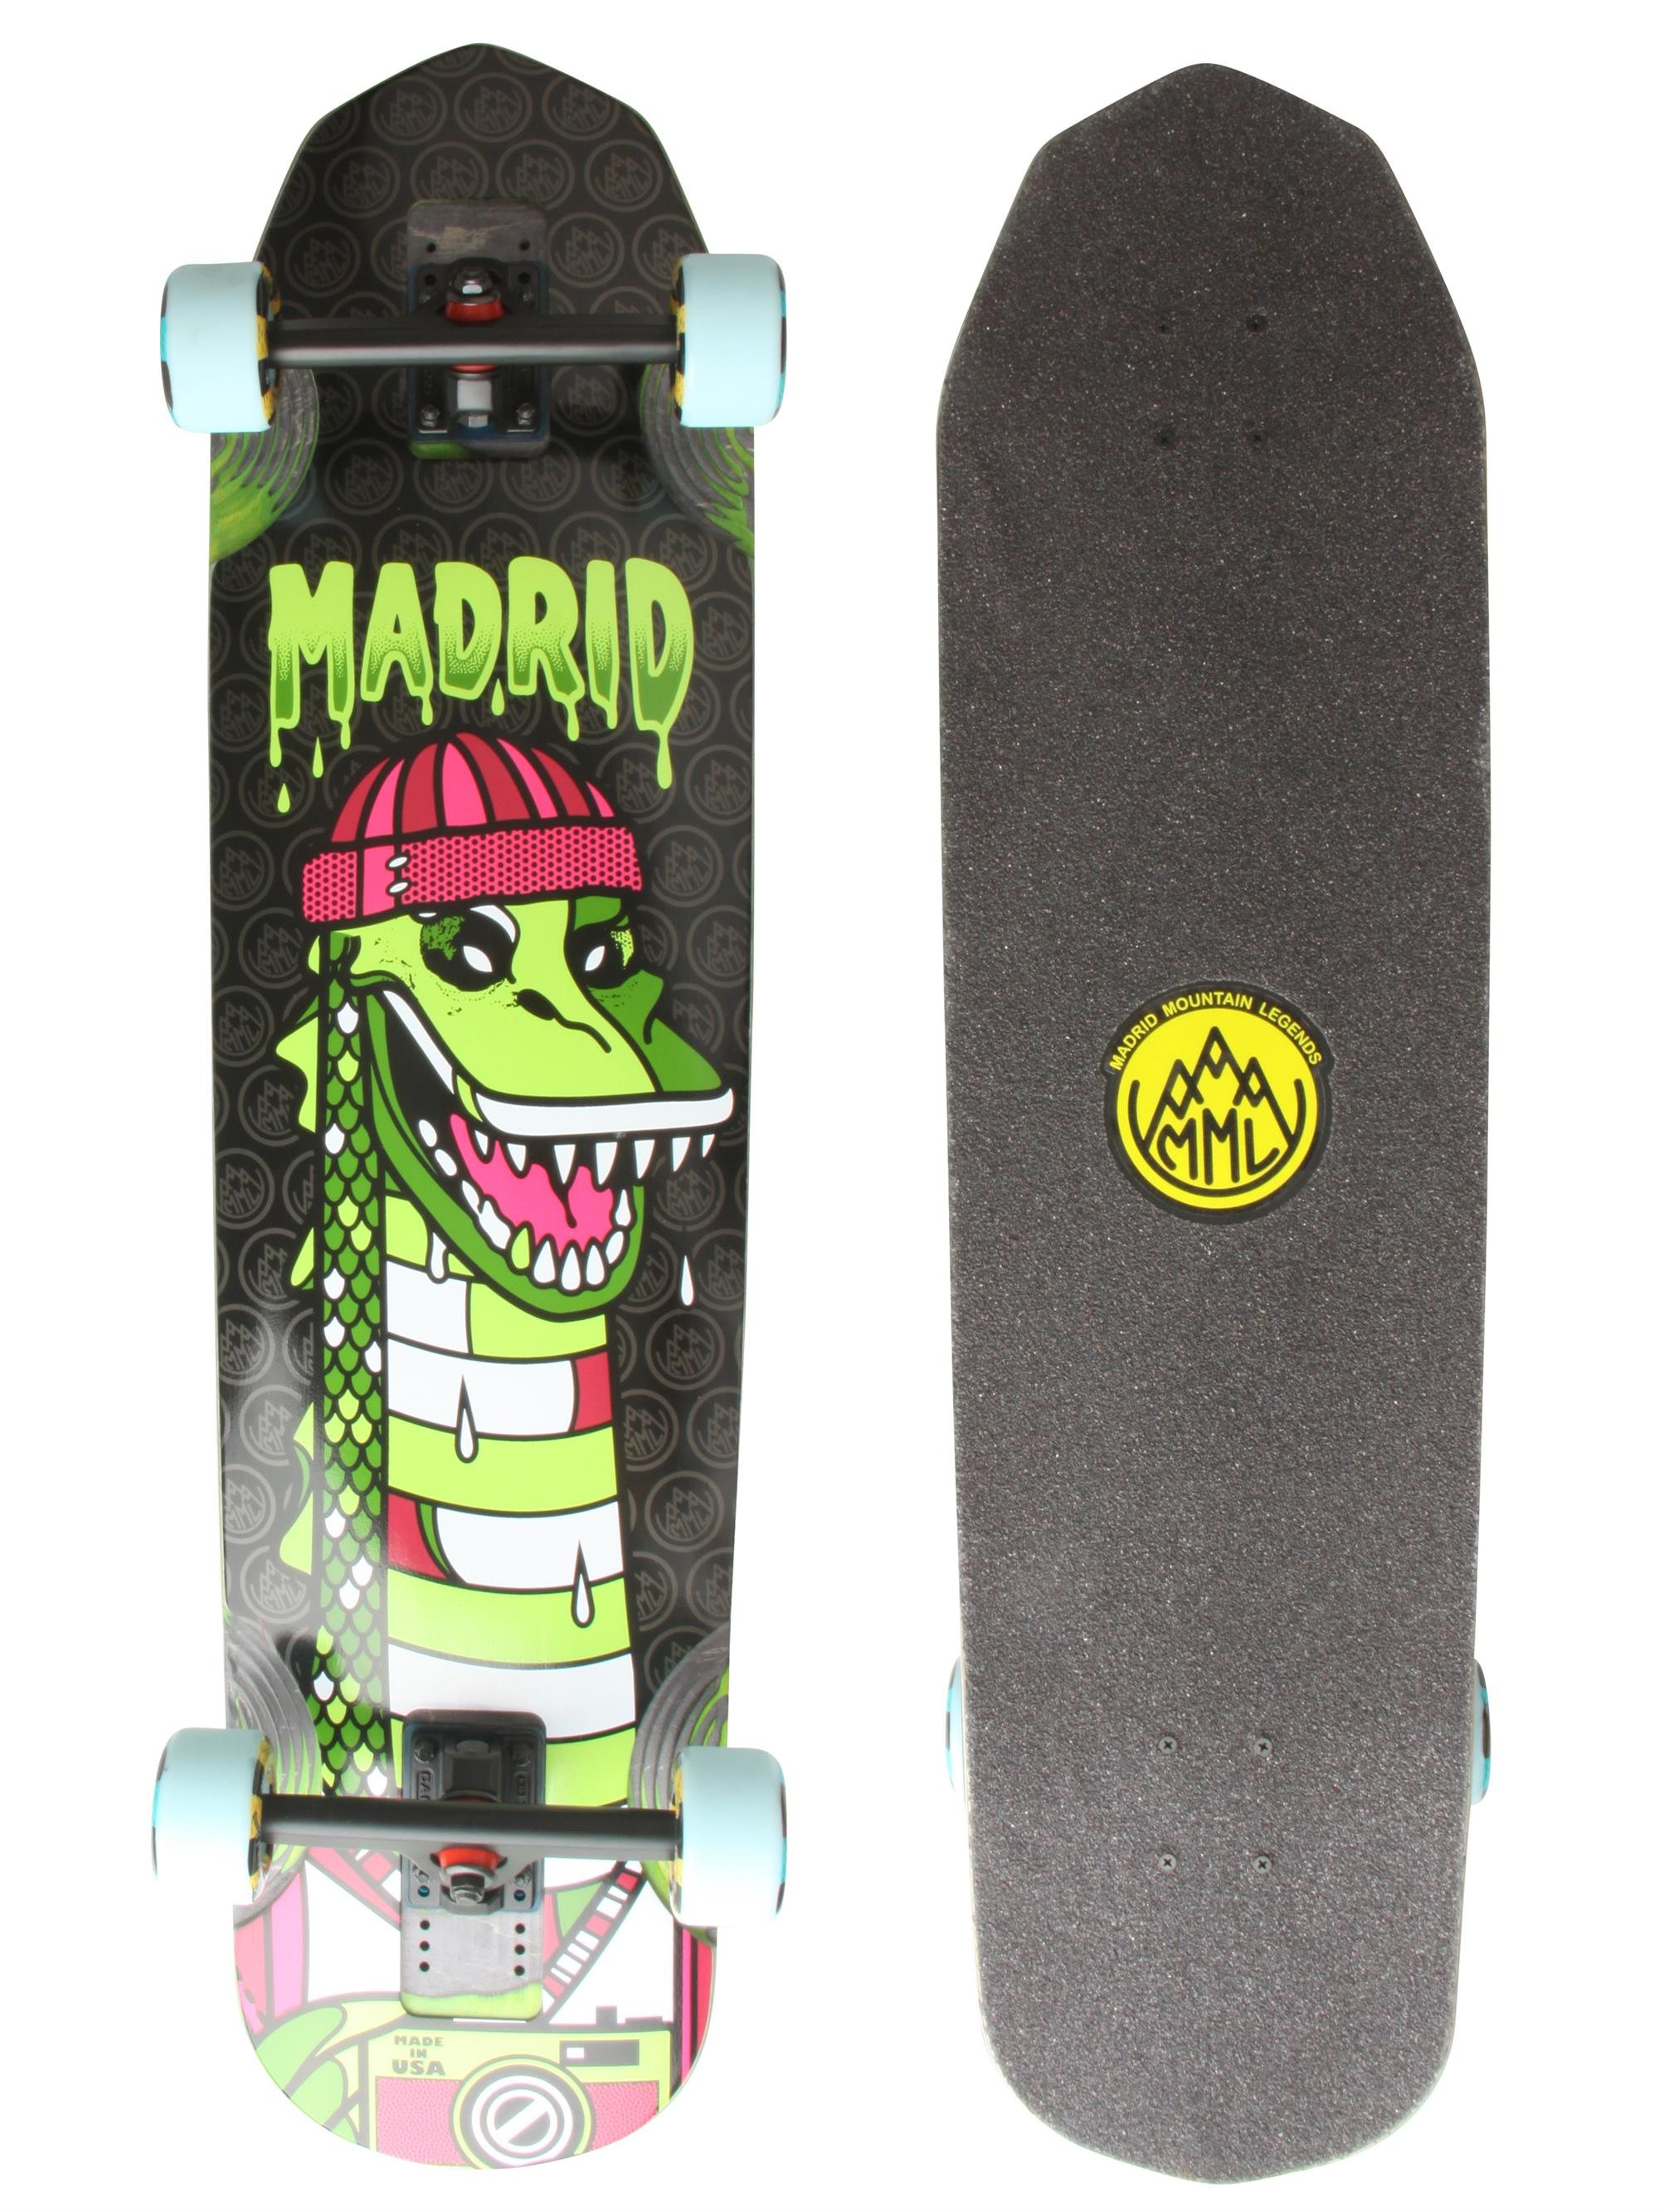 madrid nessie longboard